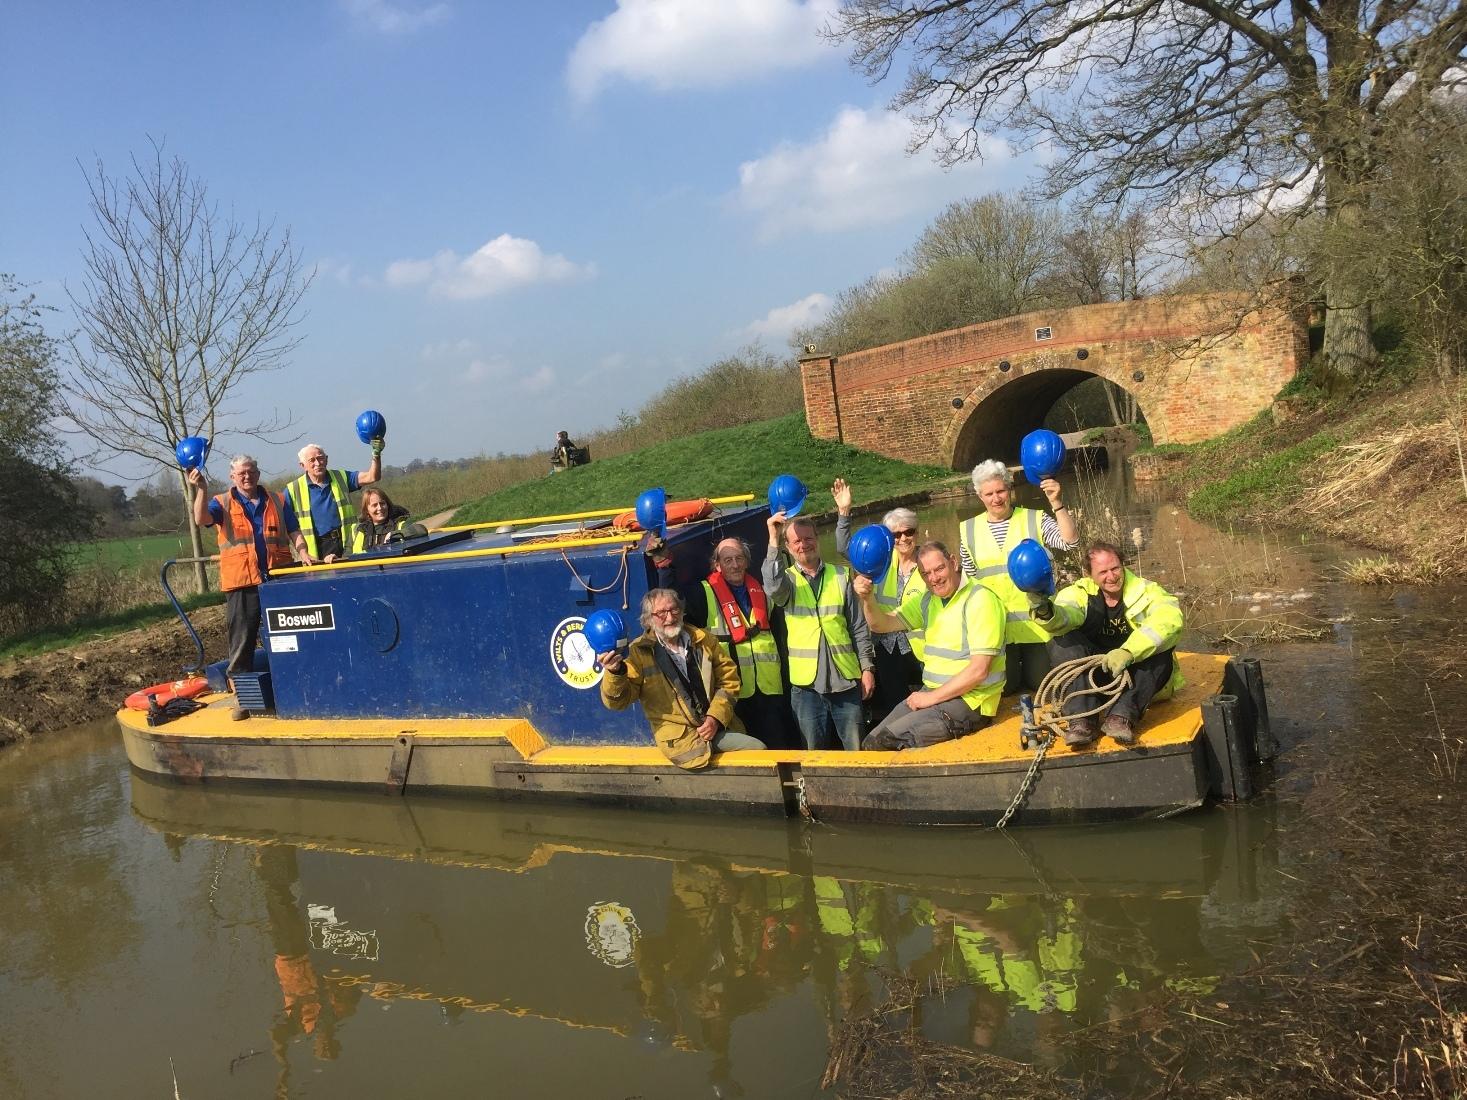 Wilts & Berks Canal Through Time